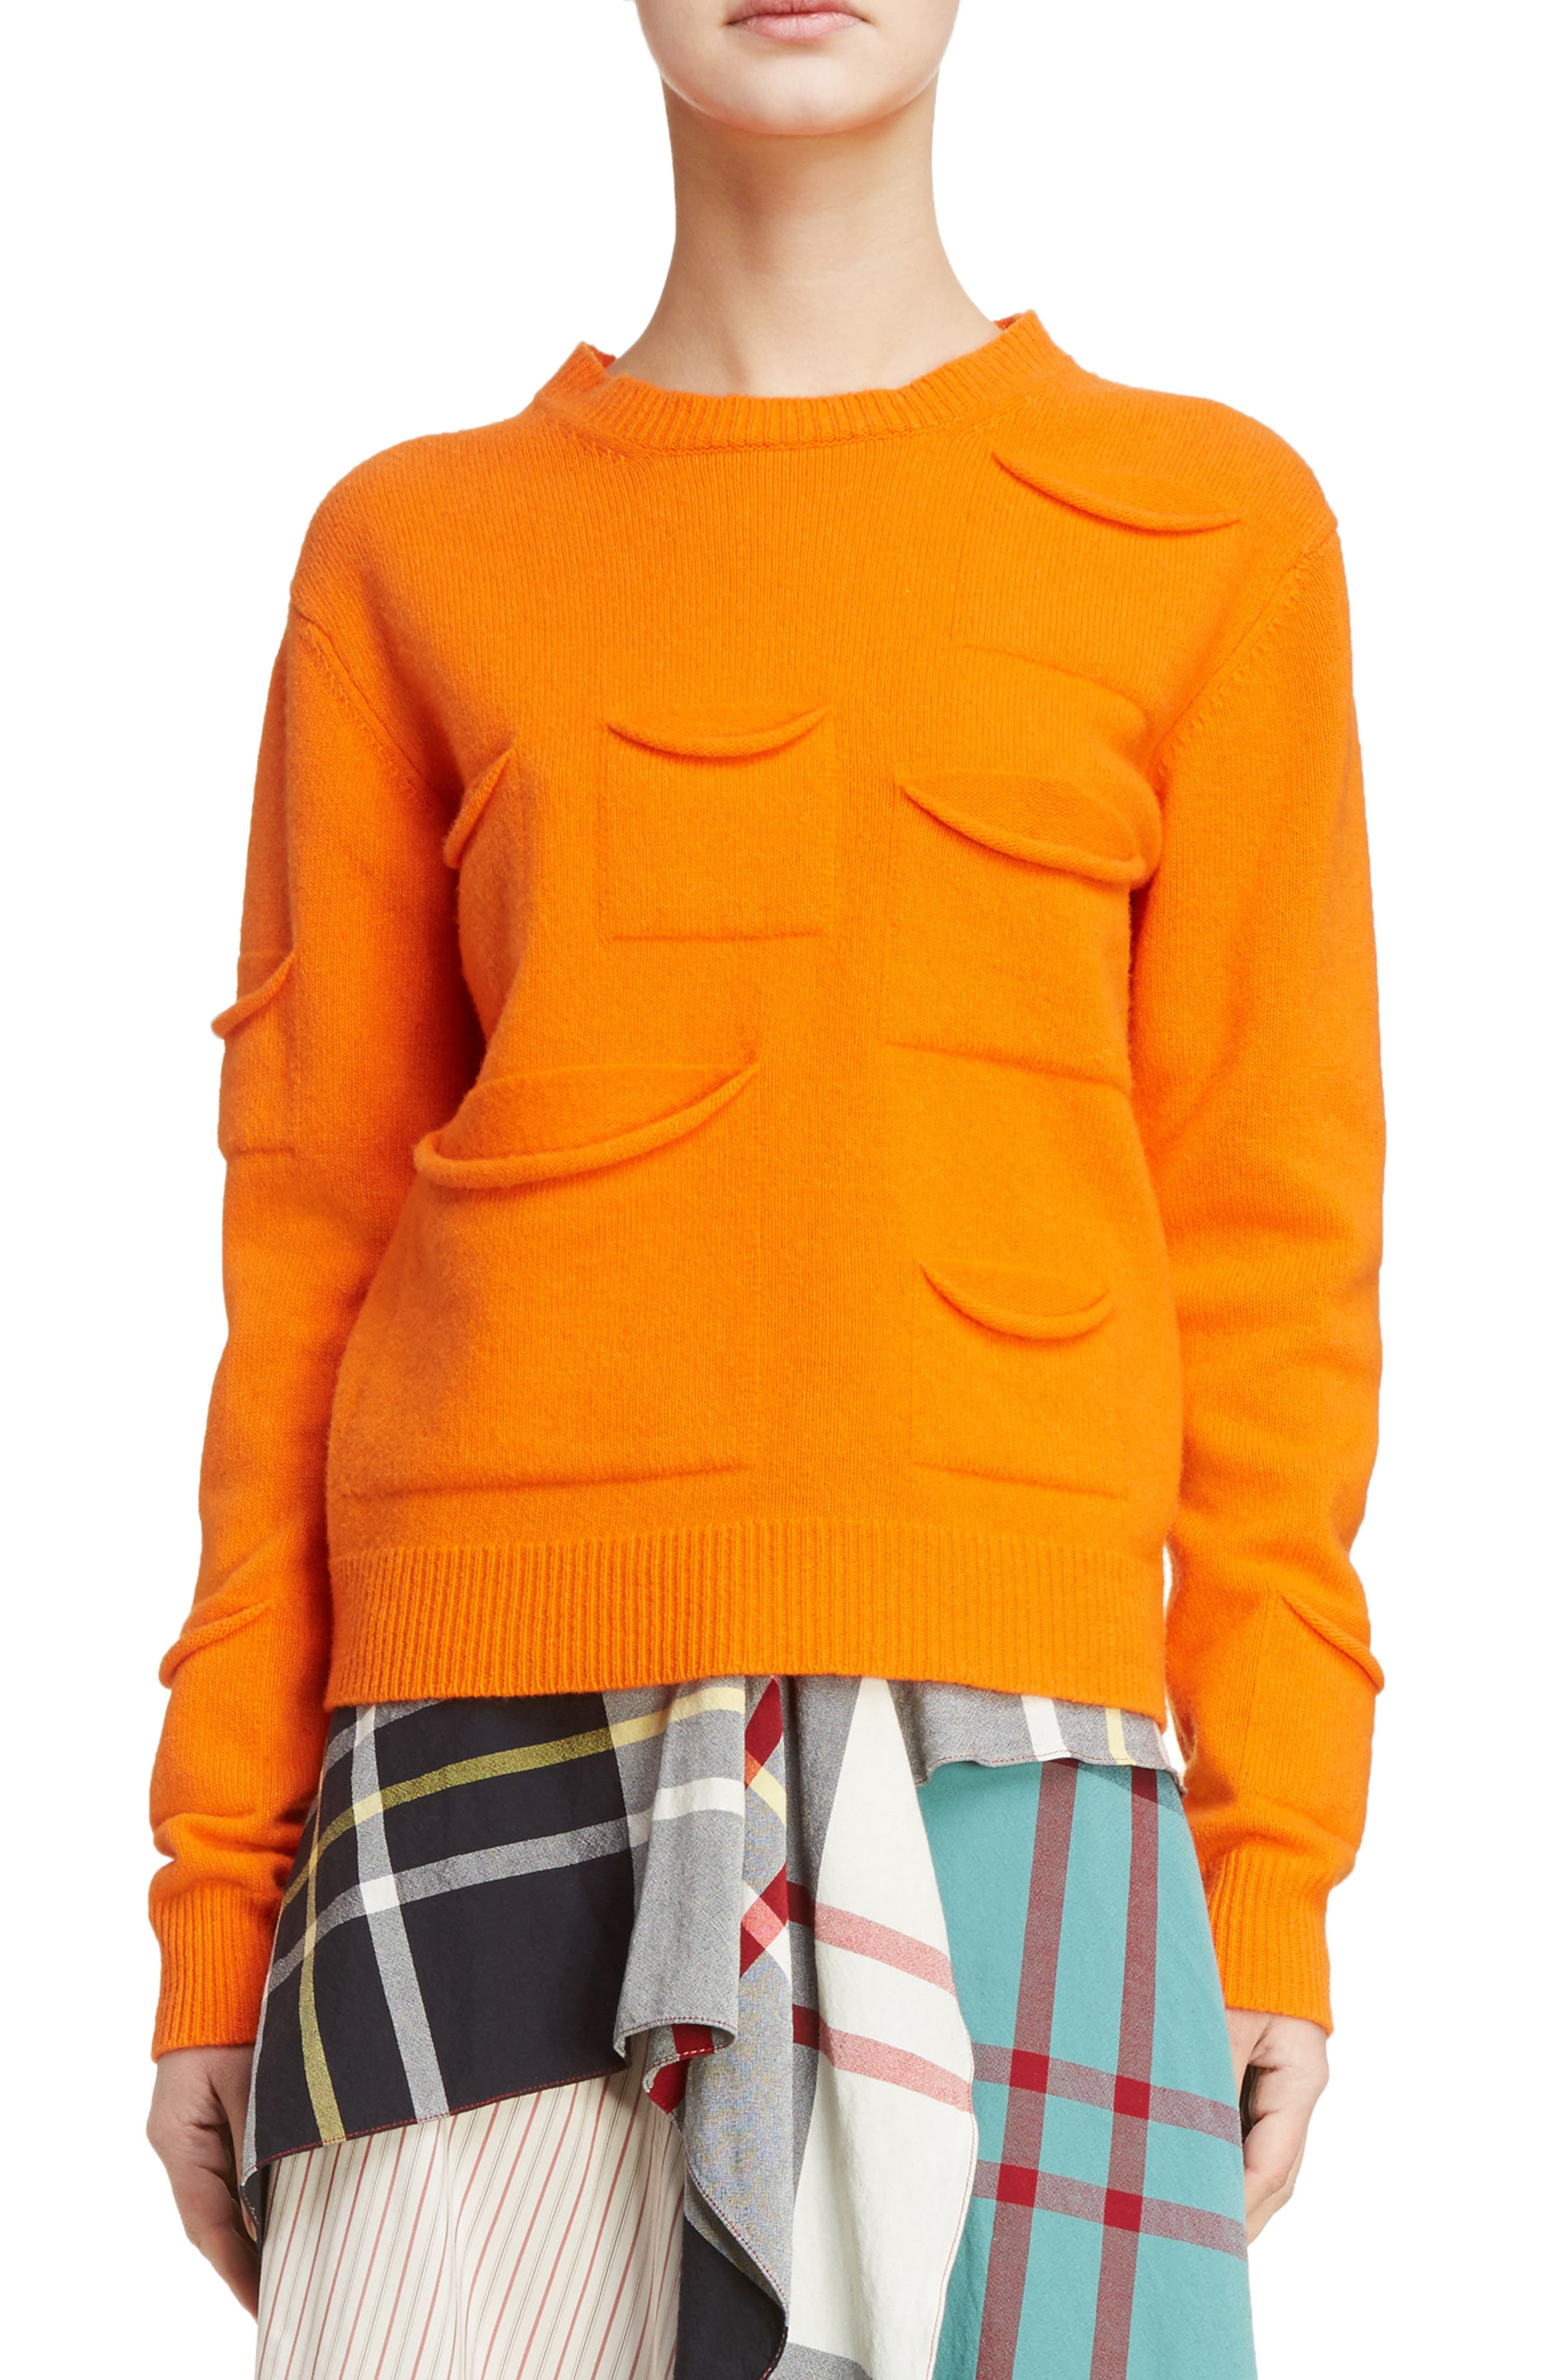 J.W.ANDERSON Multi Pocket Crewneck Sweater,                         Main,                         color, Tangerine